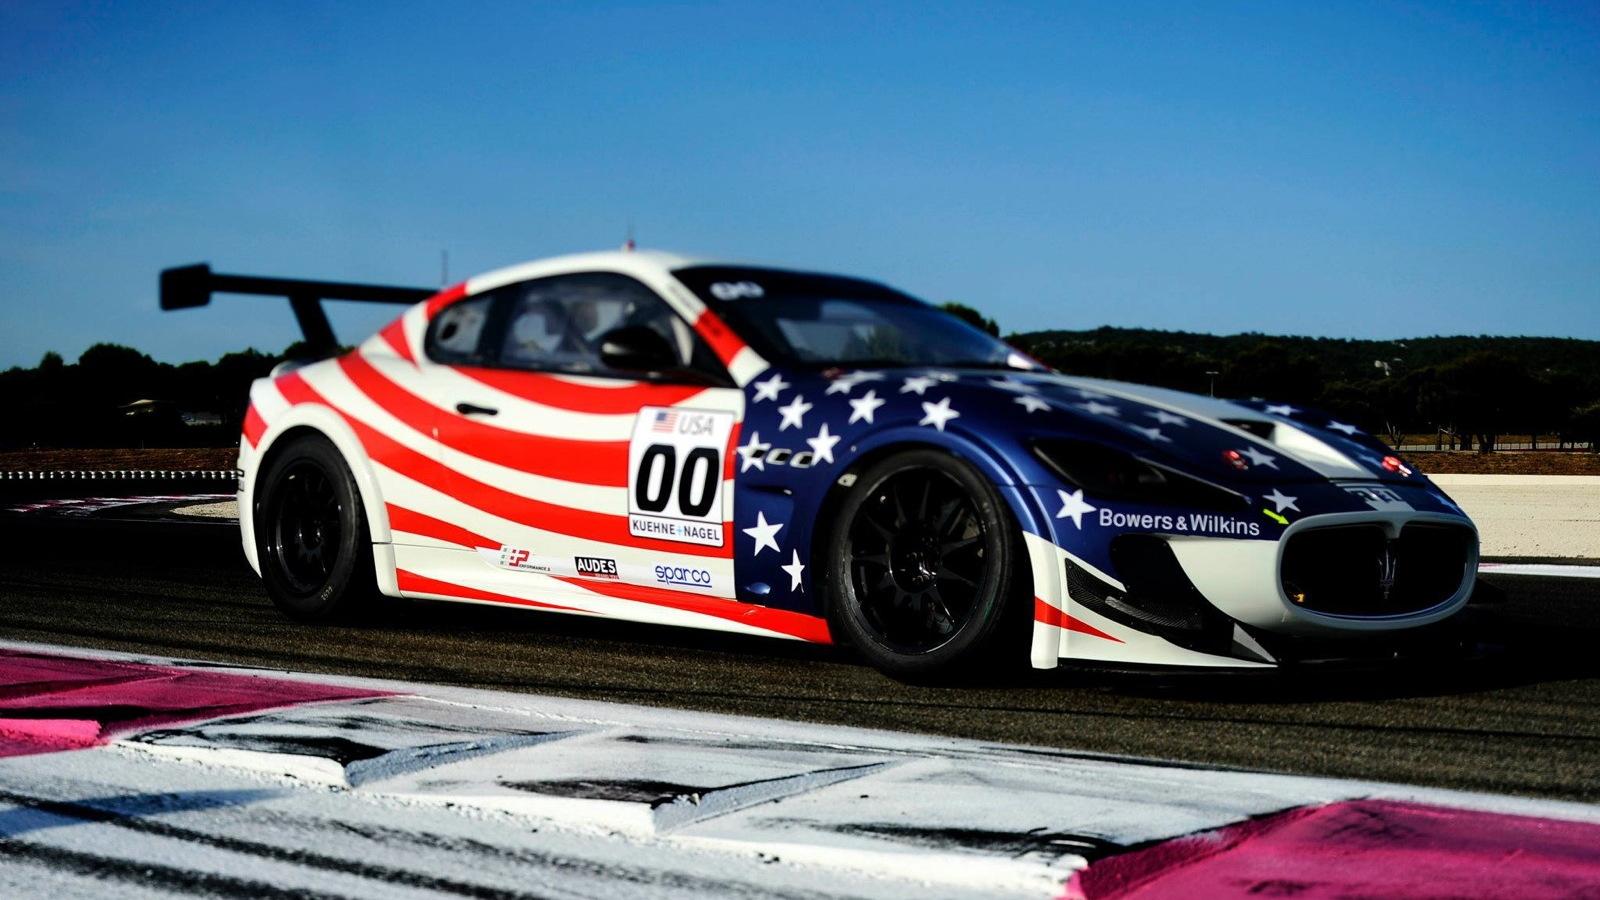 The Maserati GranTurismo MC Trofeo to be campaigned by Patrick Dempsey and Greg Tracy